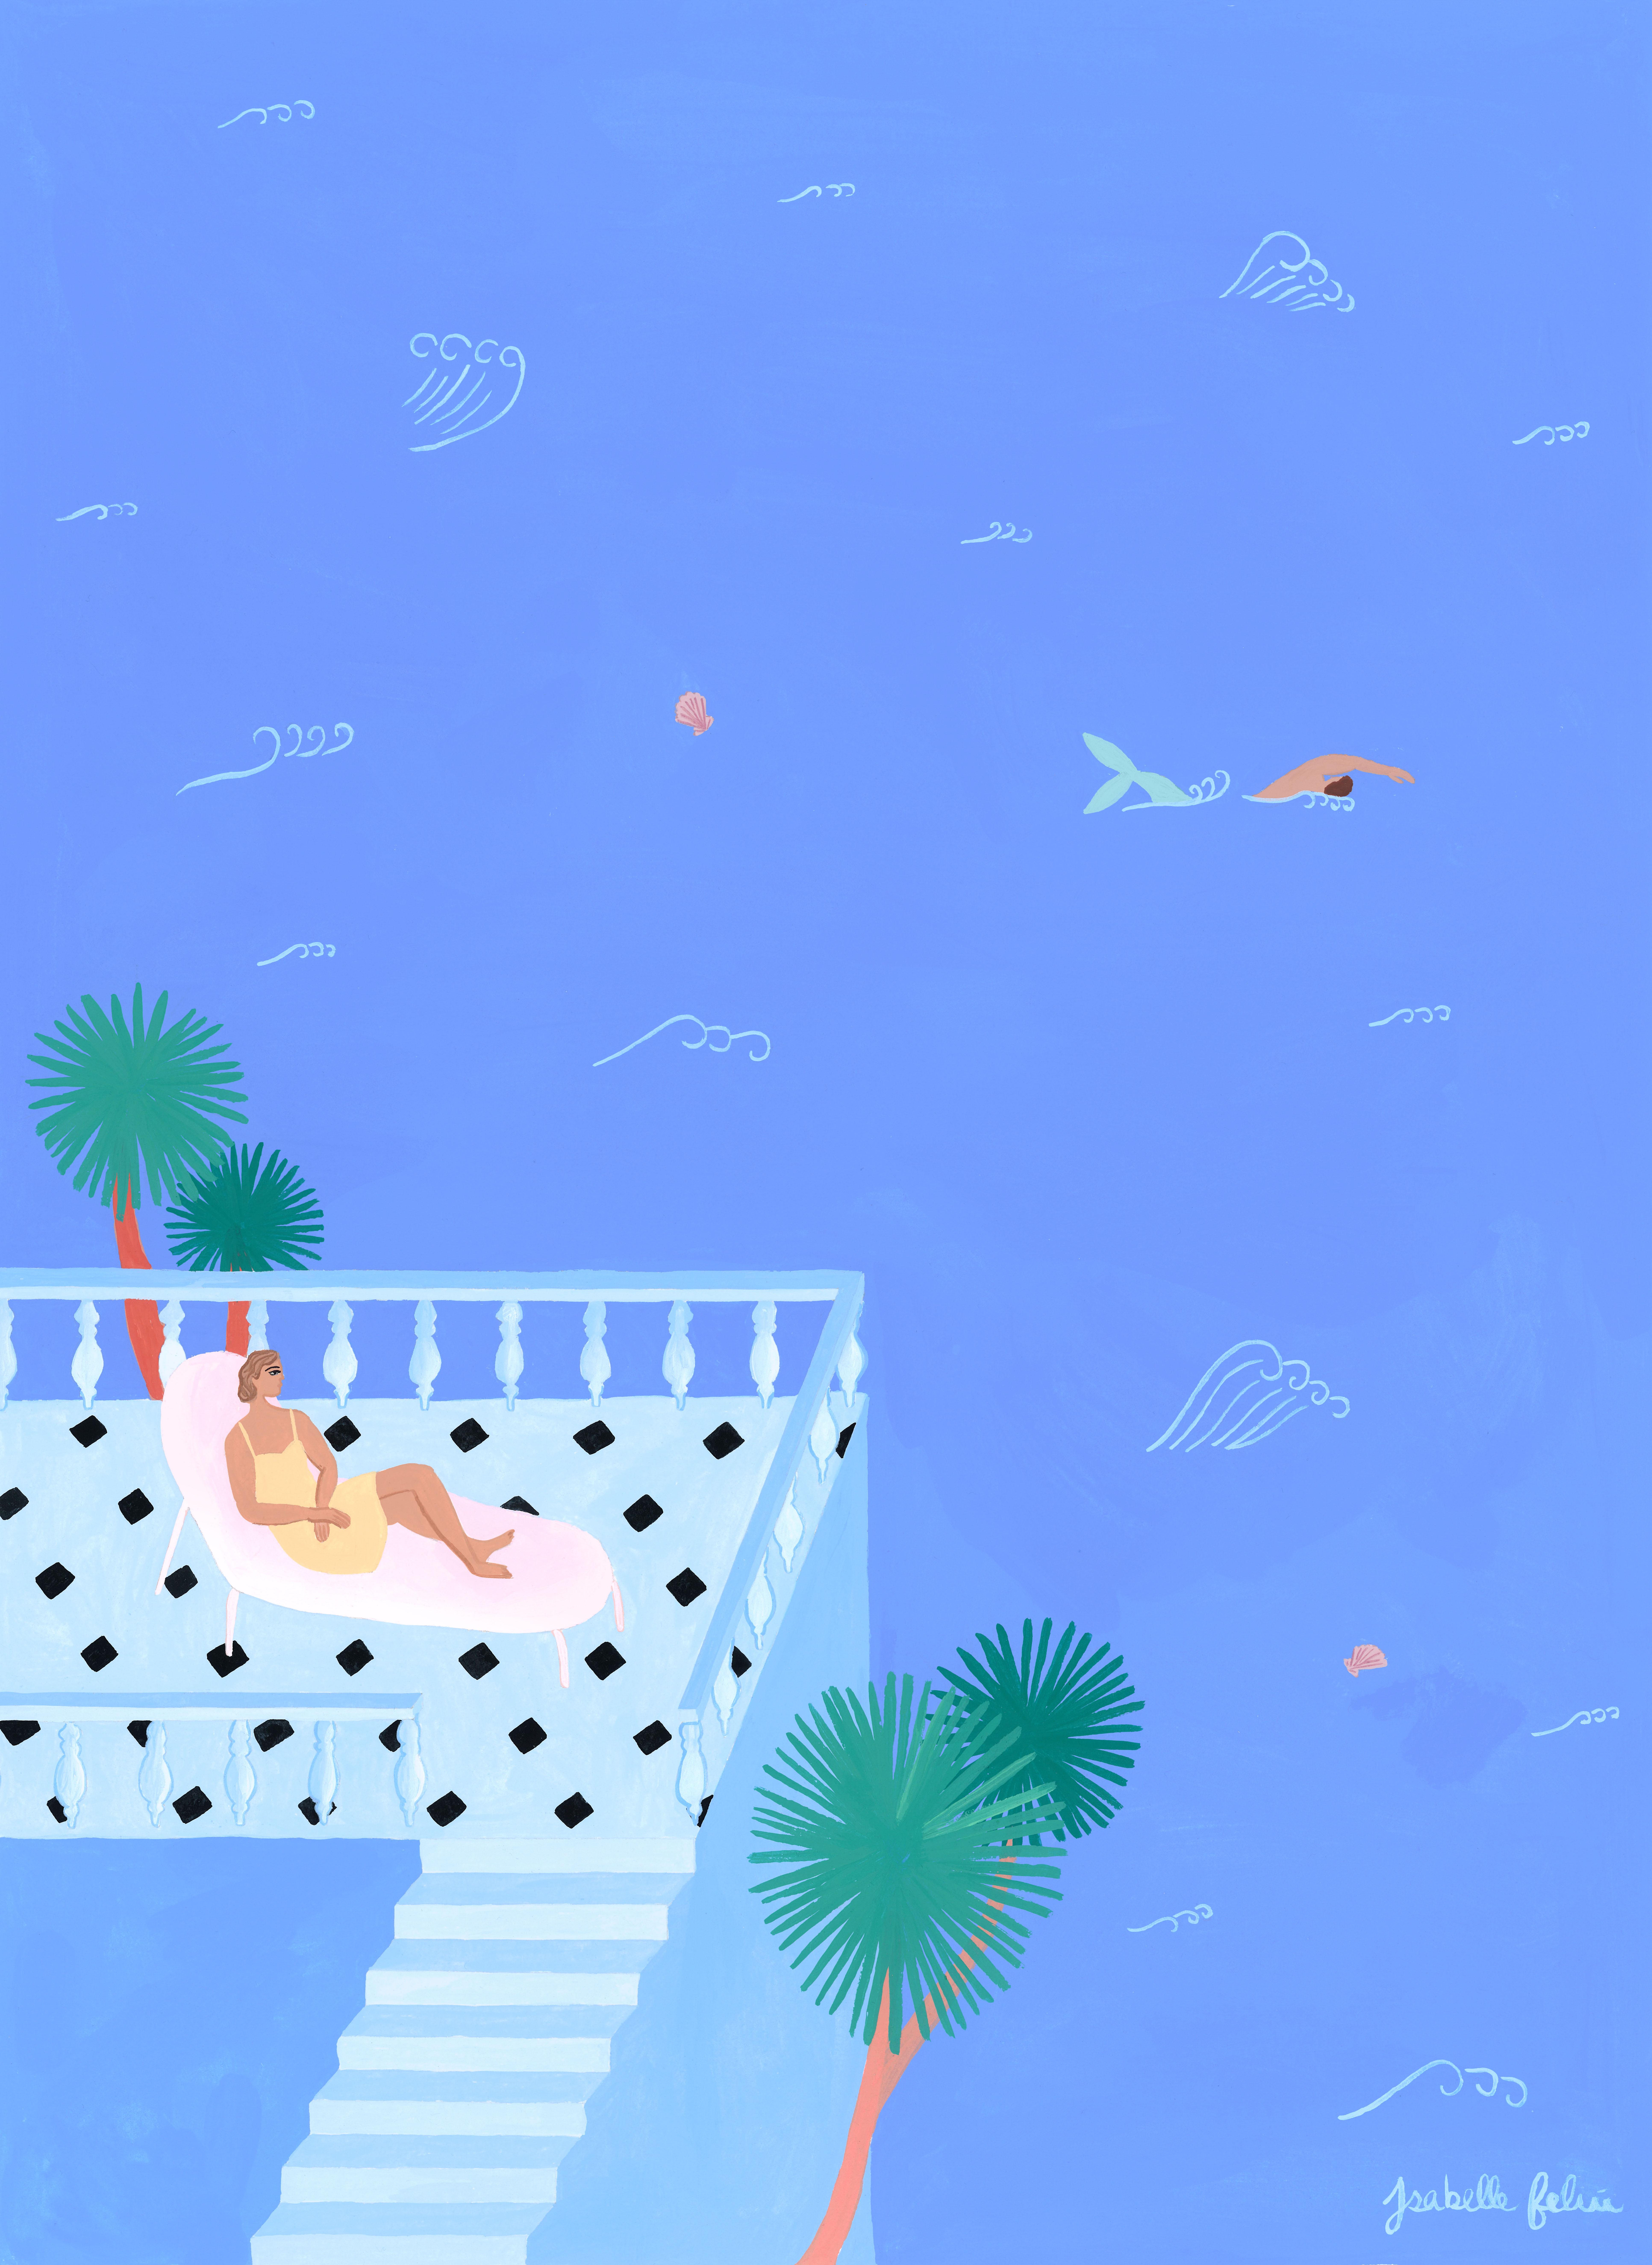 A Distant Merman by Isabelle Feliu